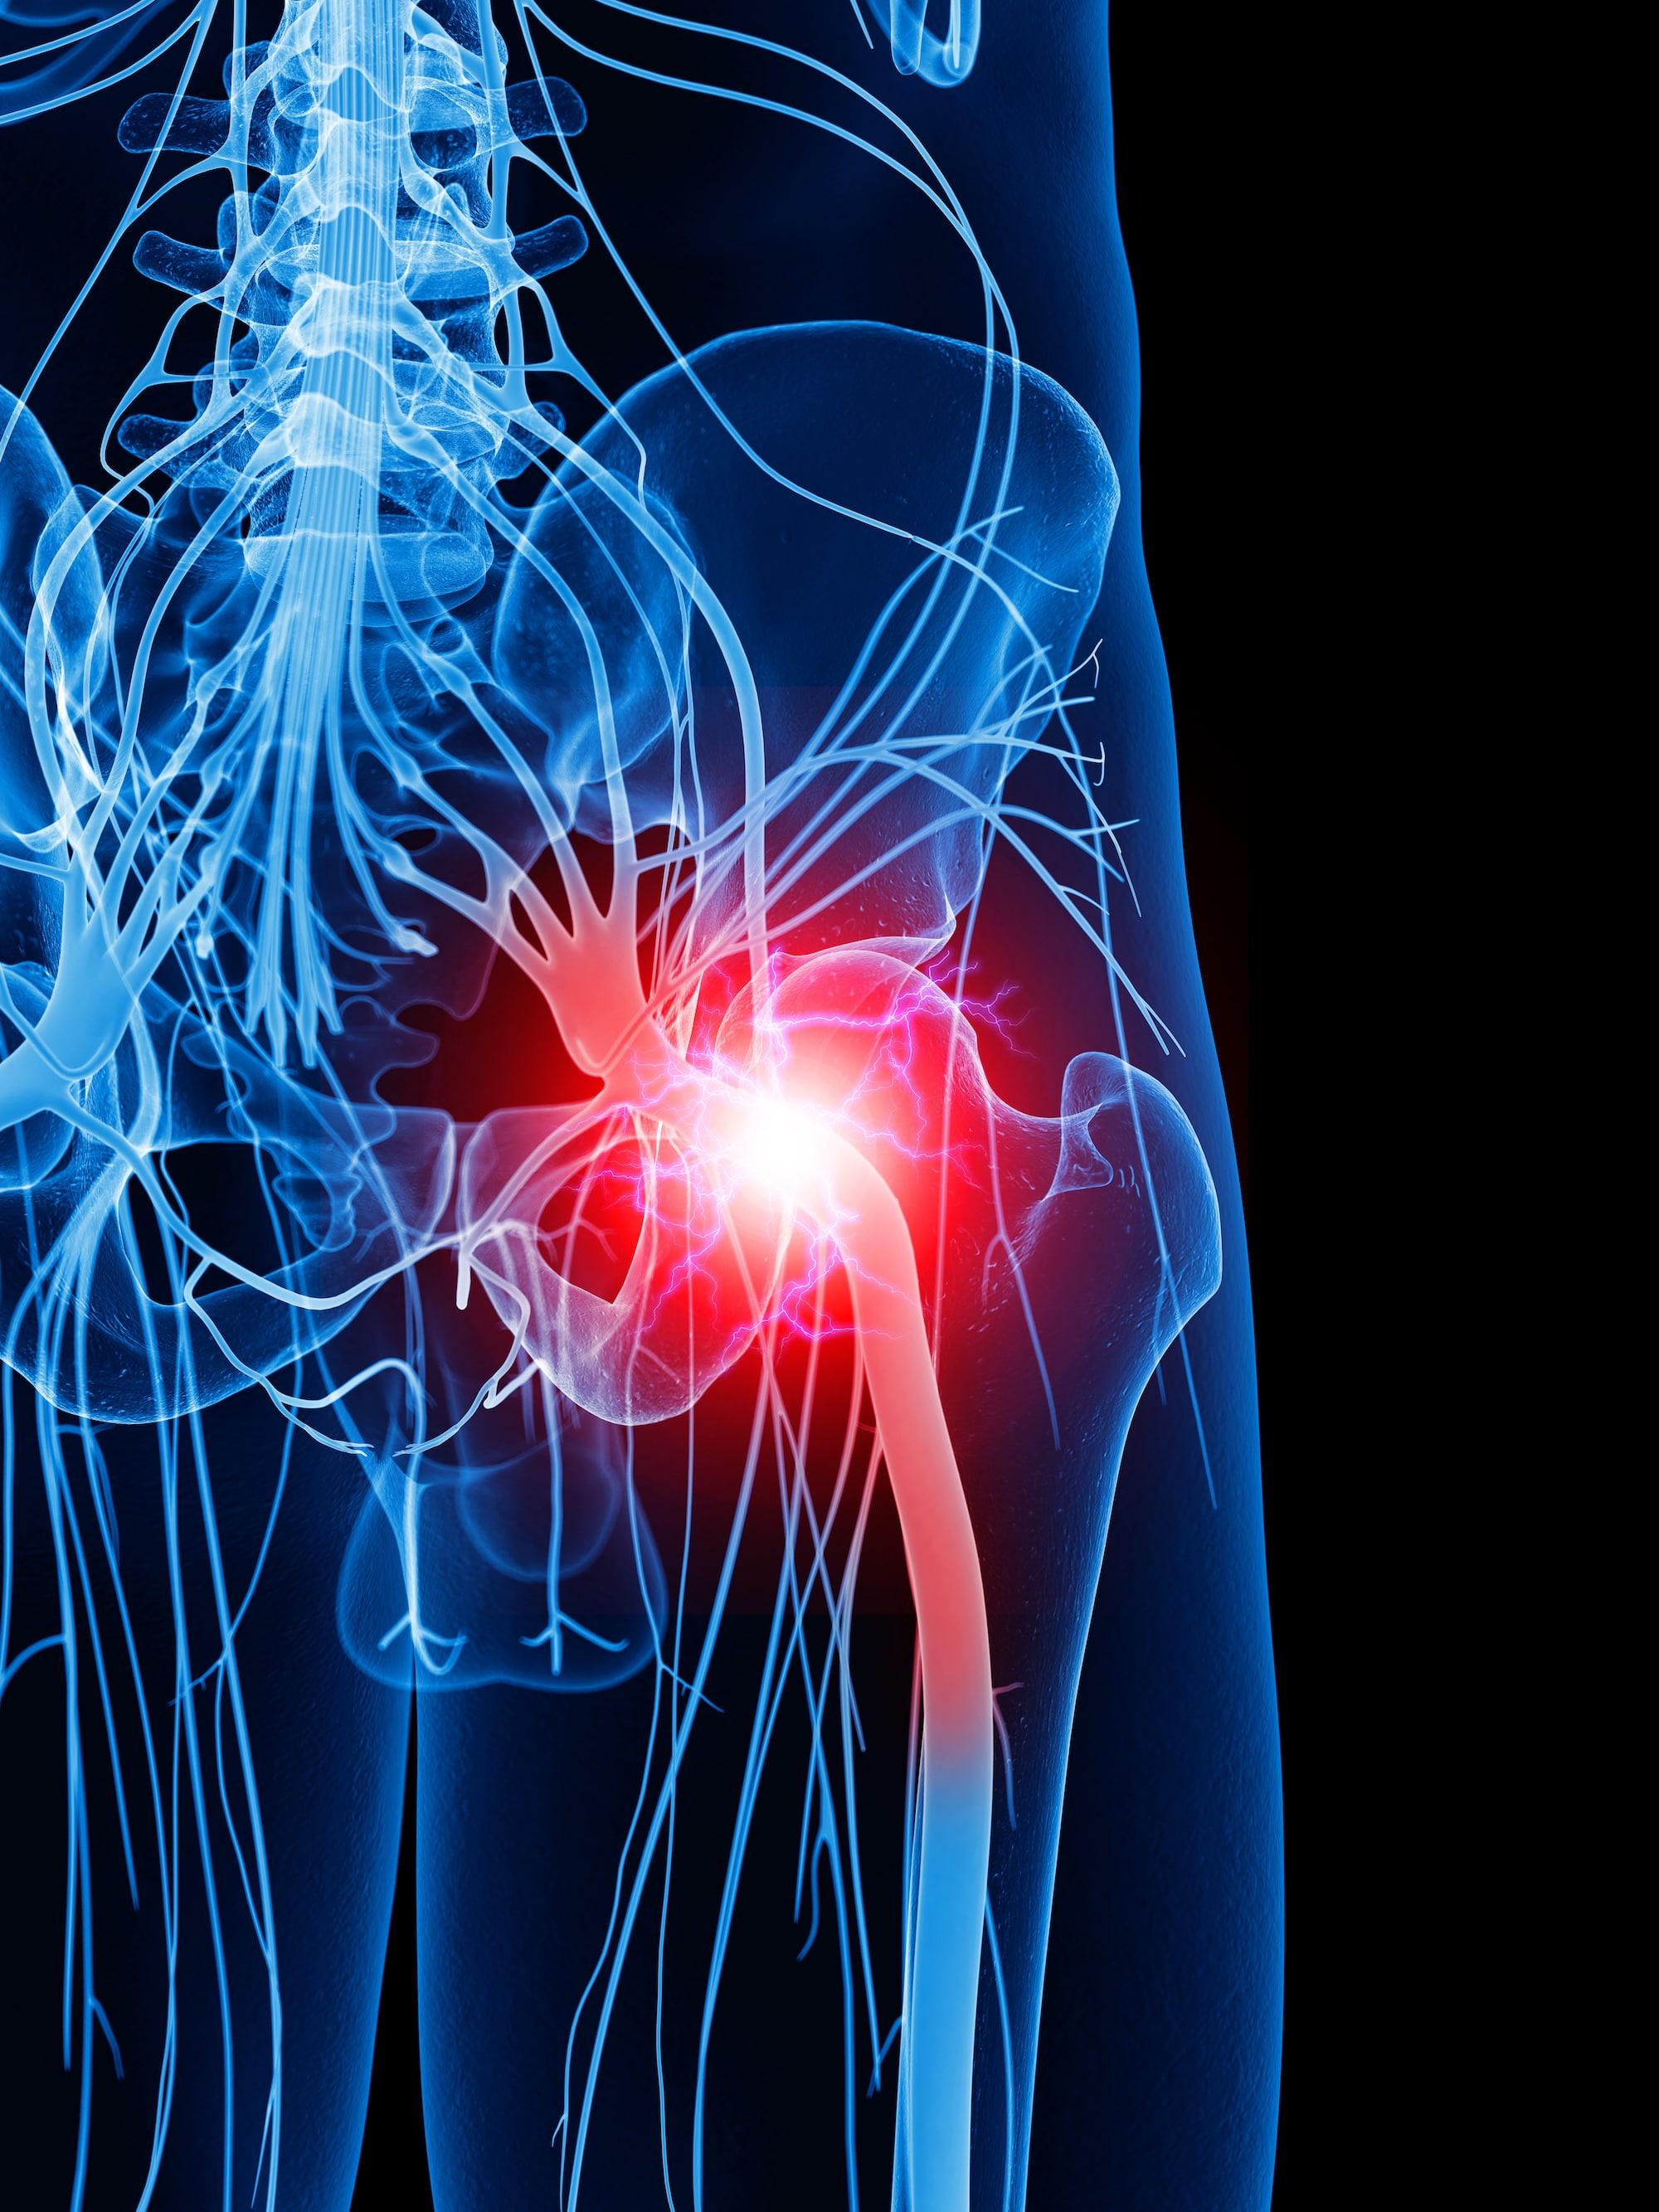 Exercises to relieve sciatic pain - Adele's Pilates